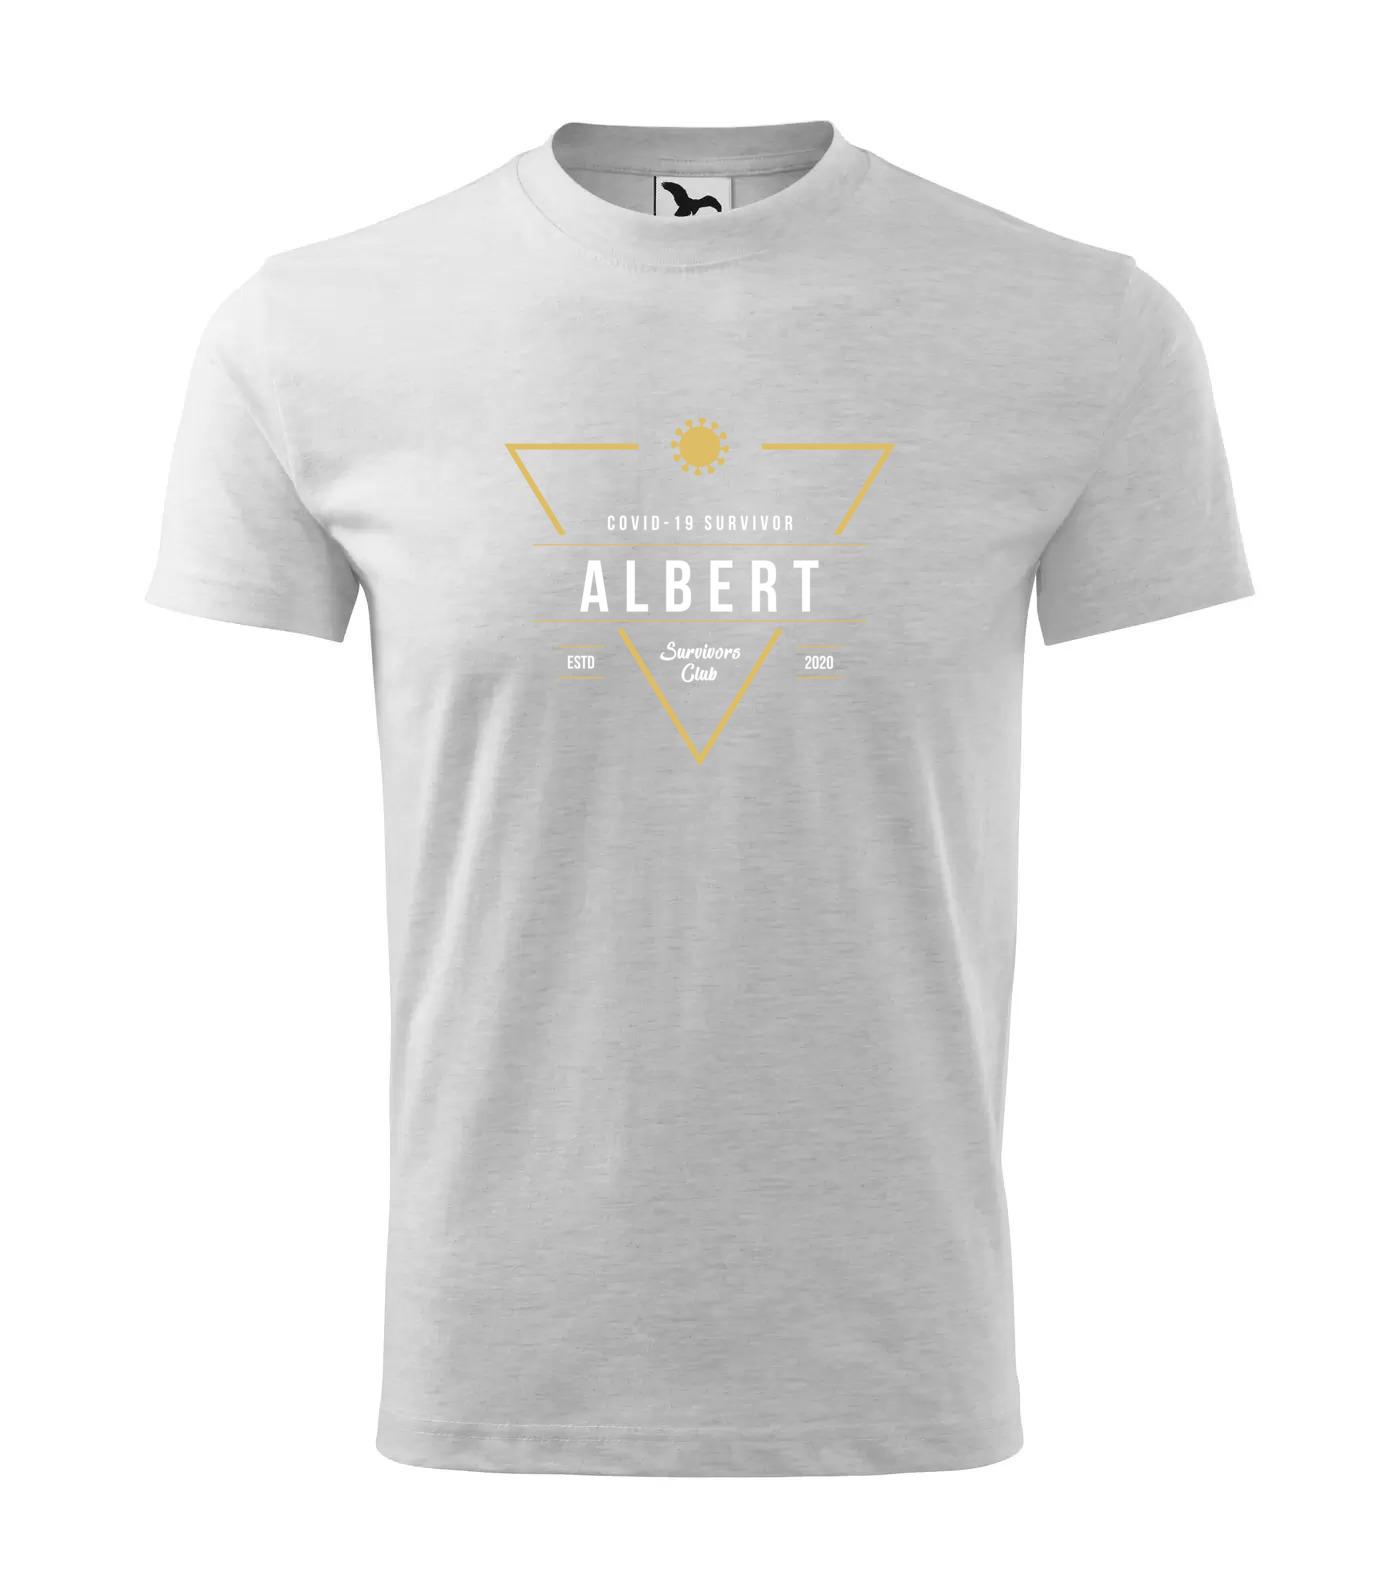 Tričko Survivor Club Albert